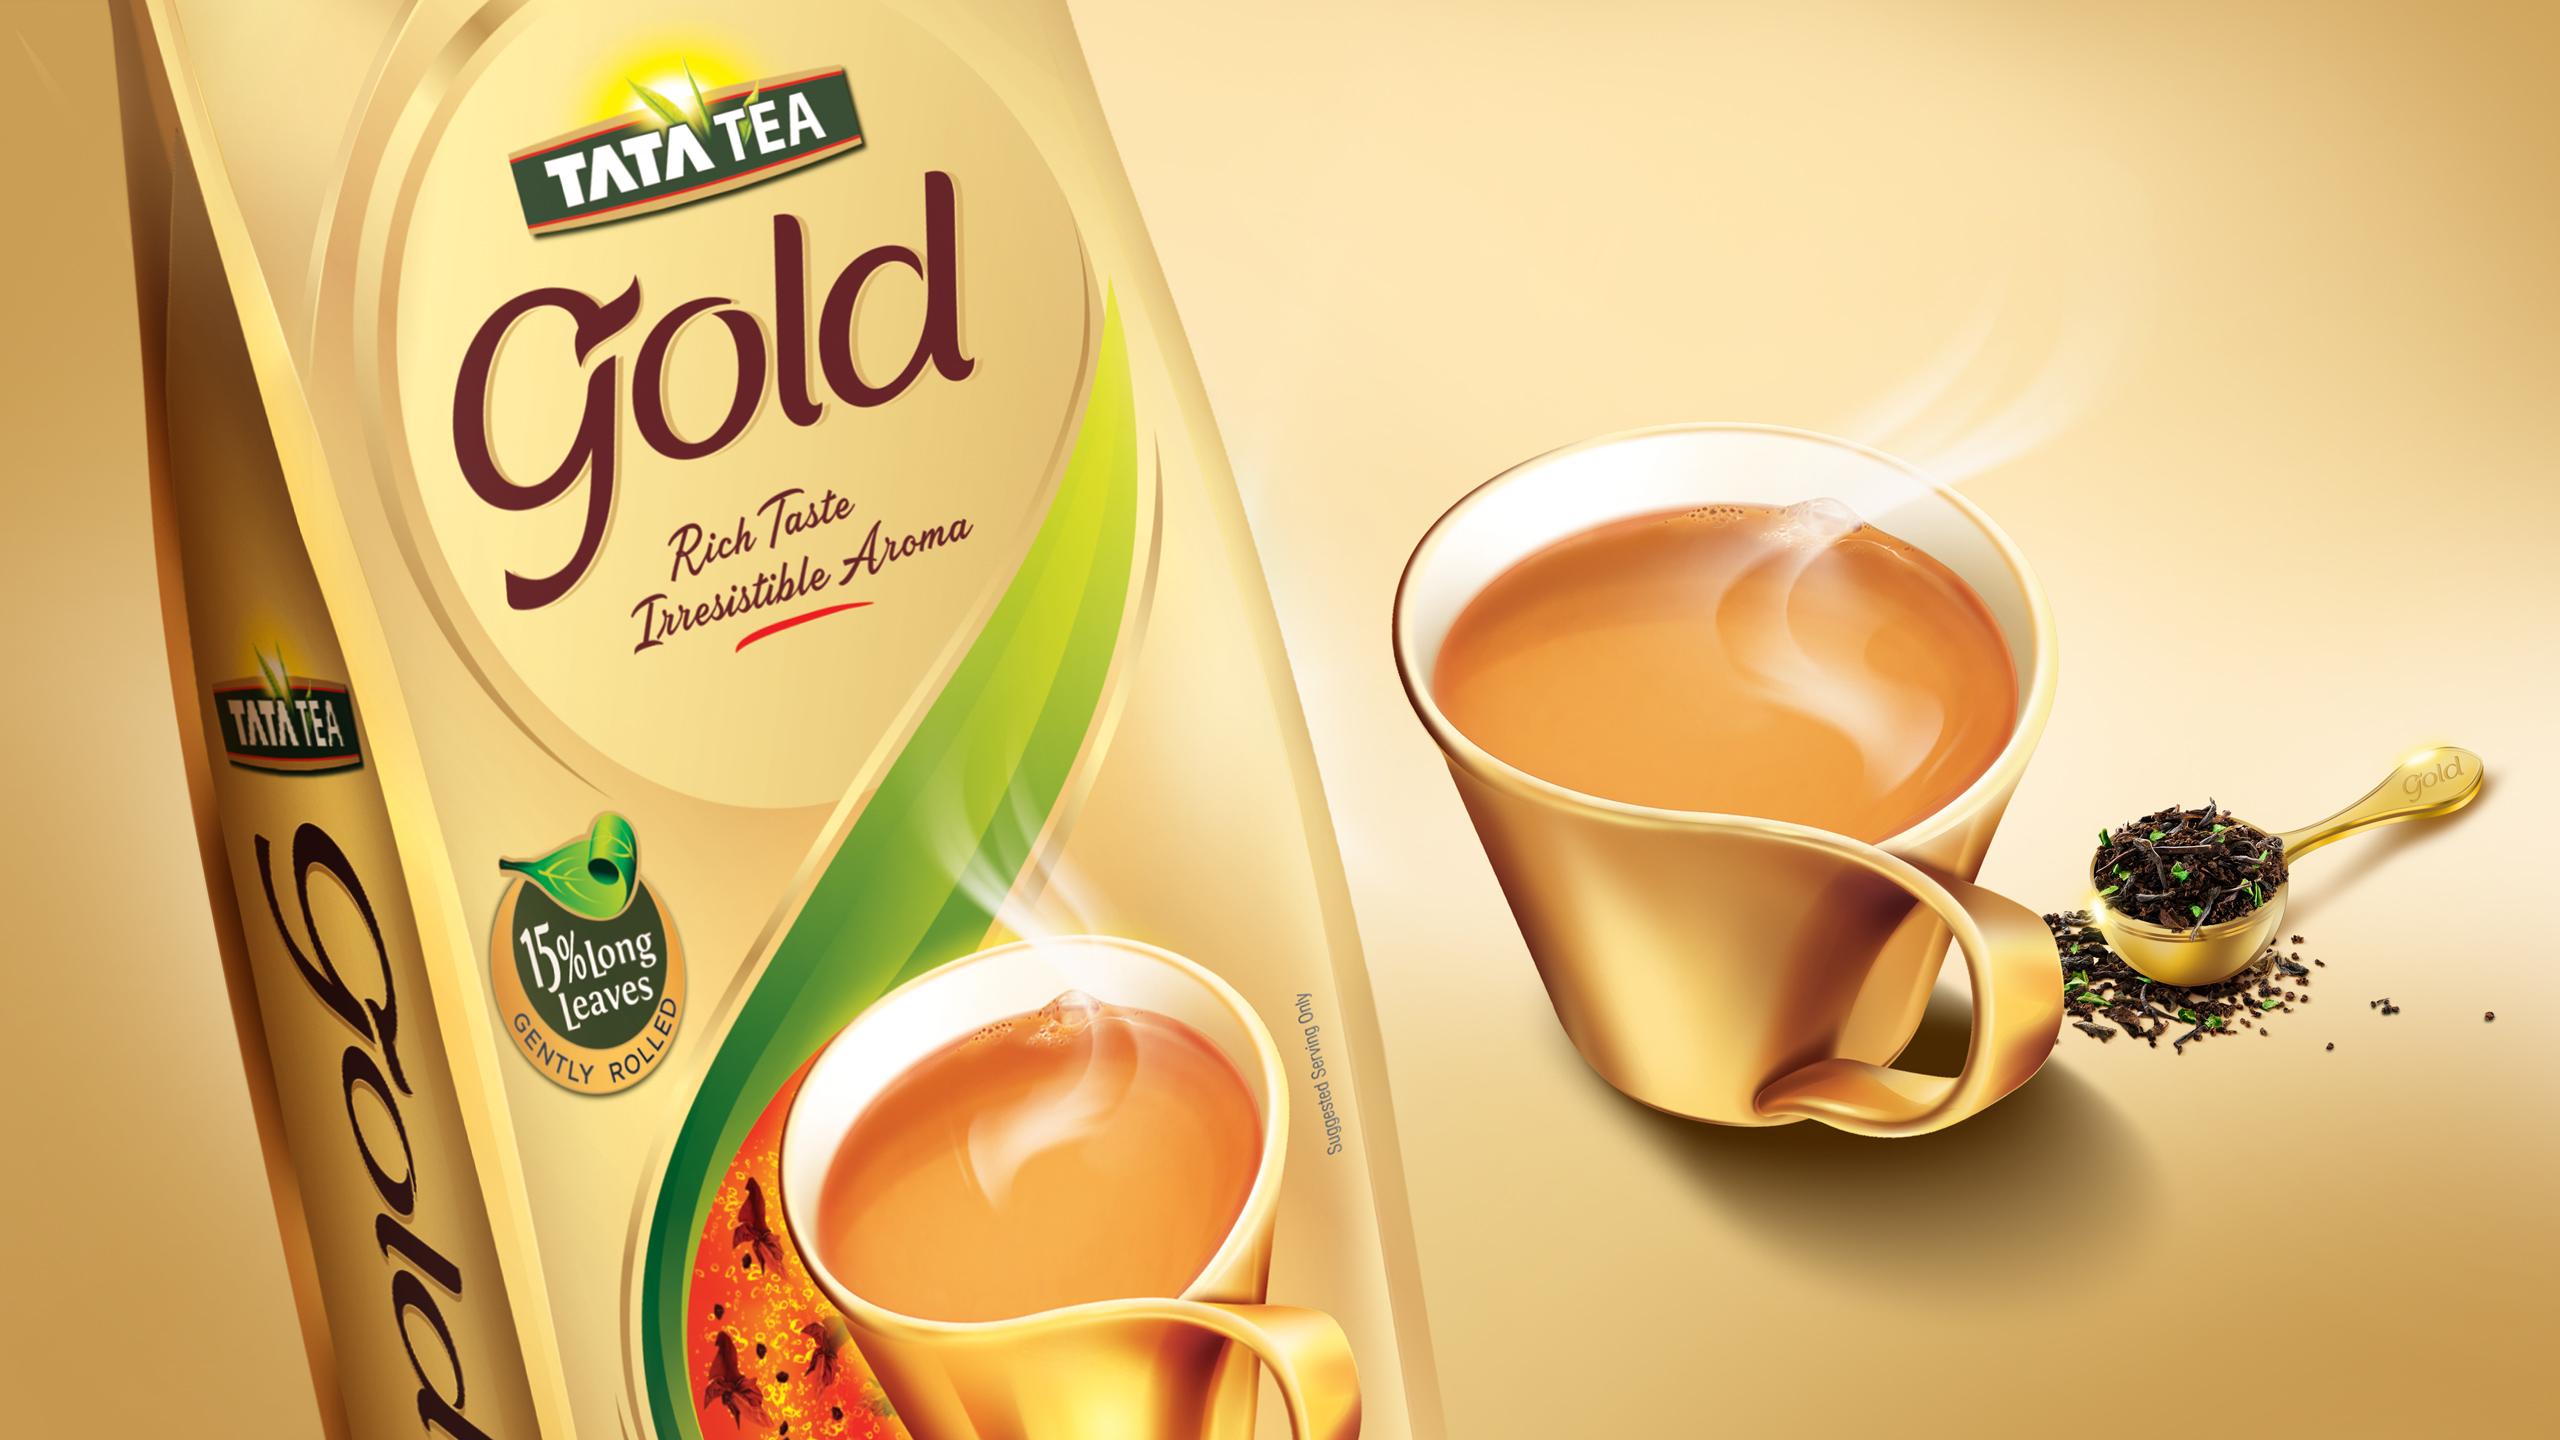 Tata Tea Gold Brand Identity, Pack Design